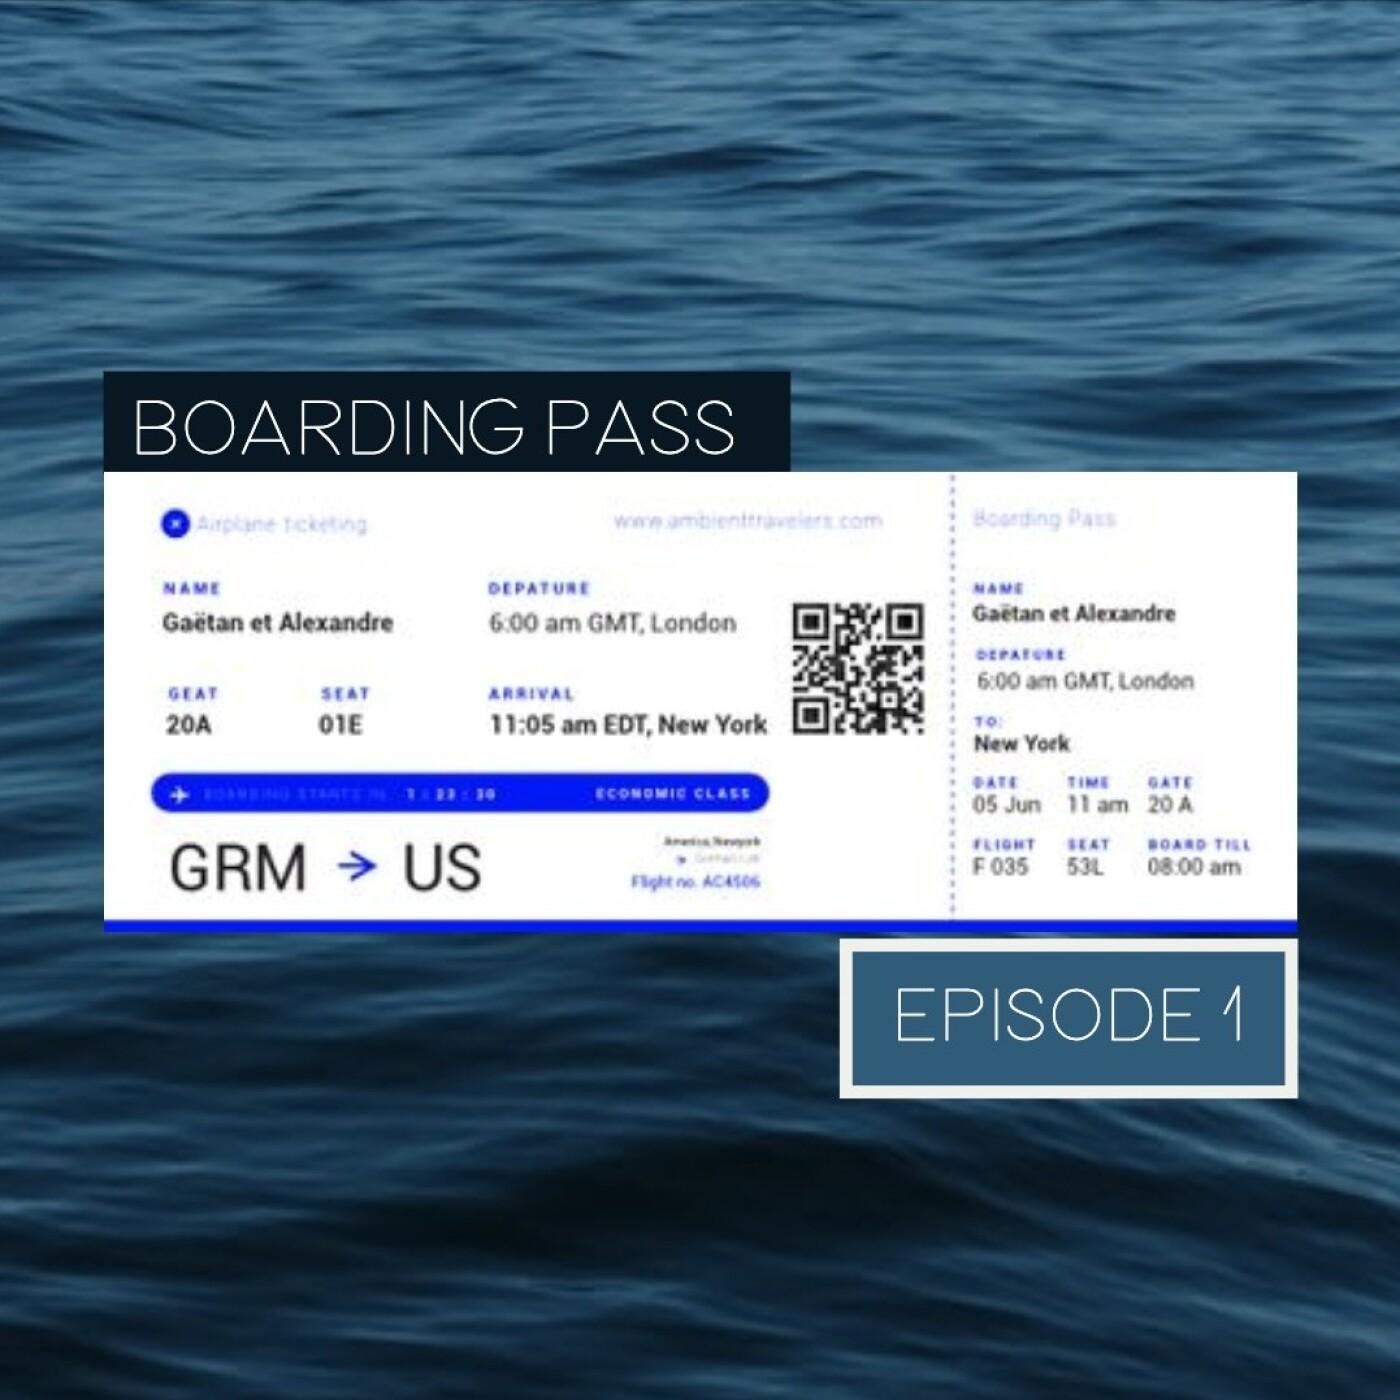 Boarding Pass 001 ✈️ Hammock et Luca Longobardi